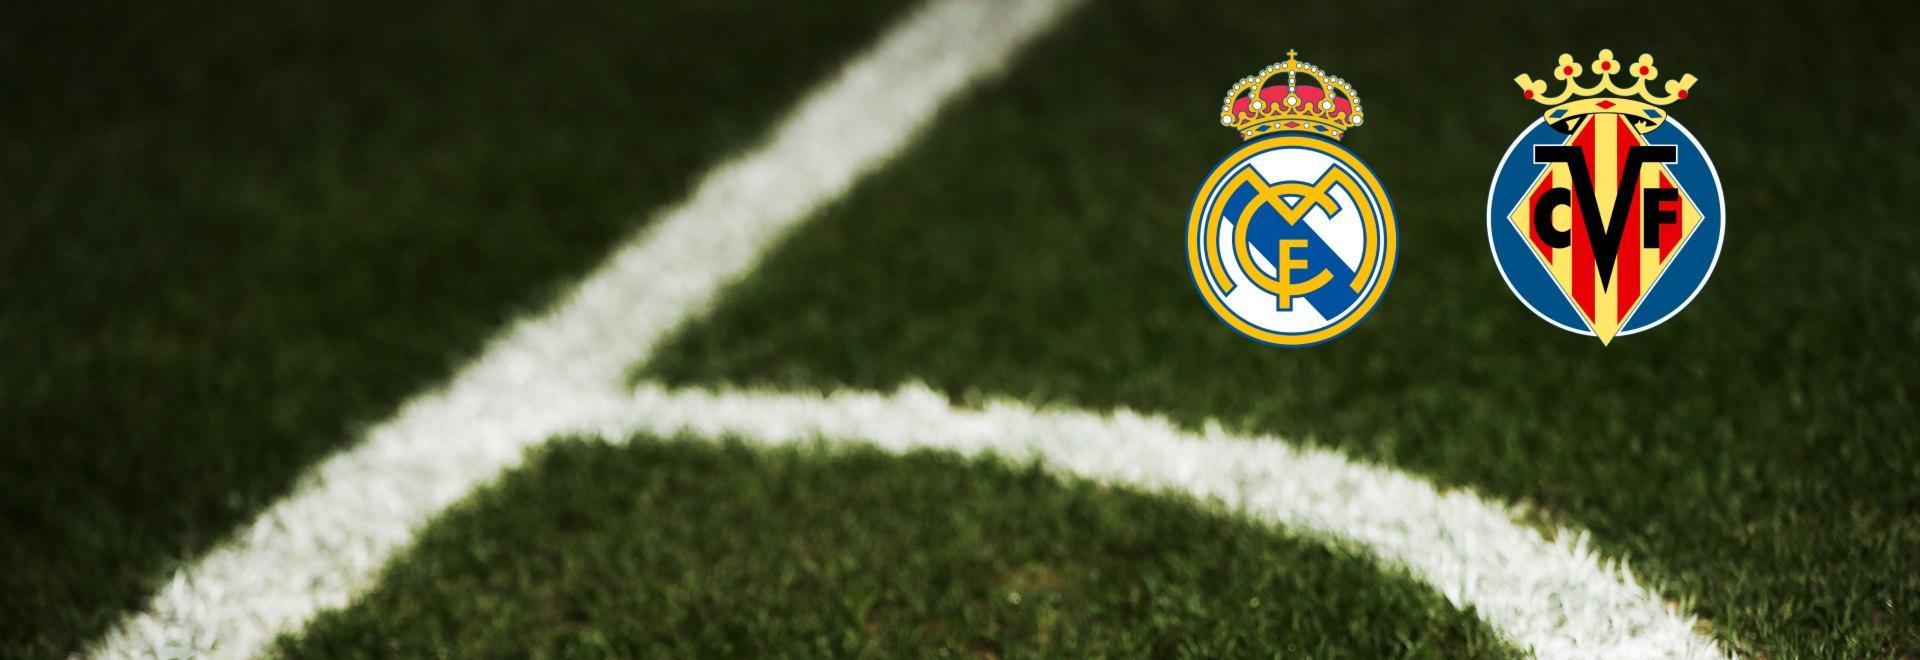 Real Madrid - Villarreal. 38a g.